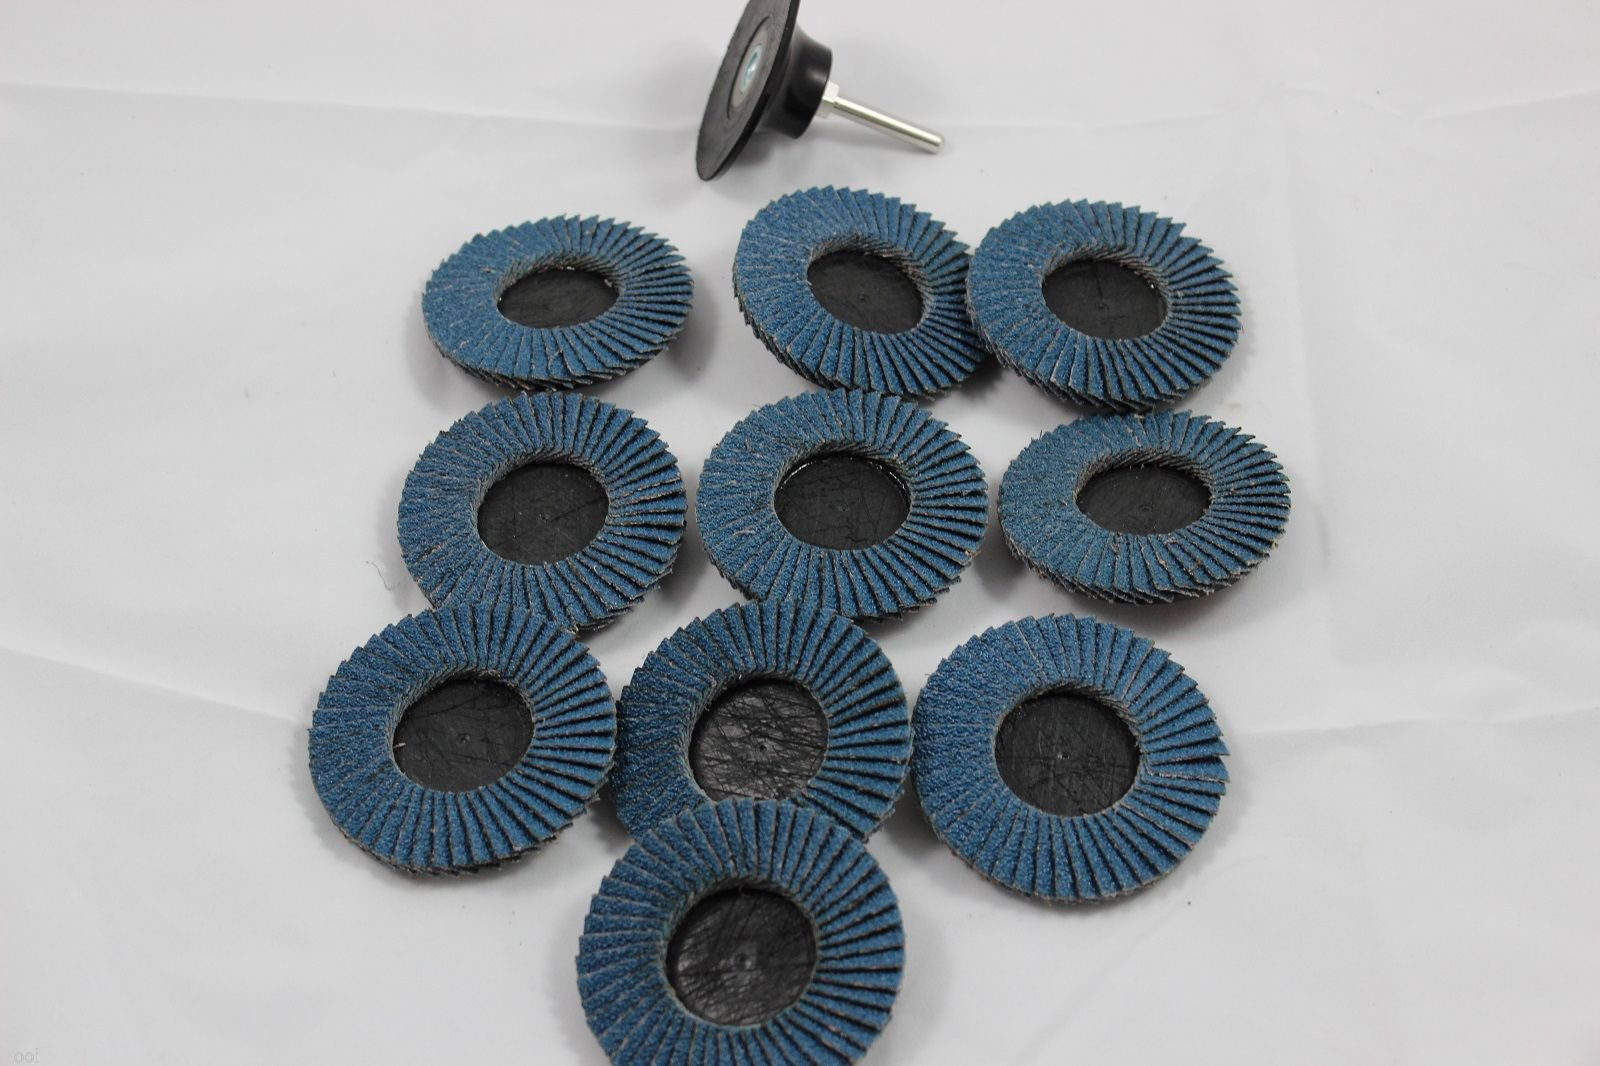 ESKALEX>>10 PC Tools USA 3'' ROLOC Sanding Flap Discs Zirconia 40 GRIT W/Mandrel and 10 Brand New 3'' R Type Roll & Lock Roloc Flap Discs